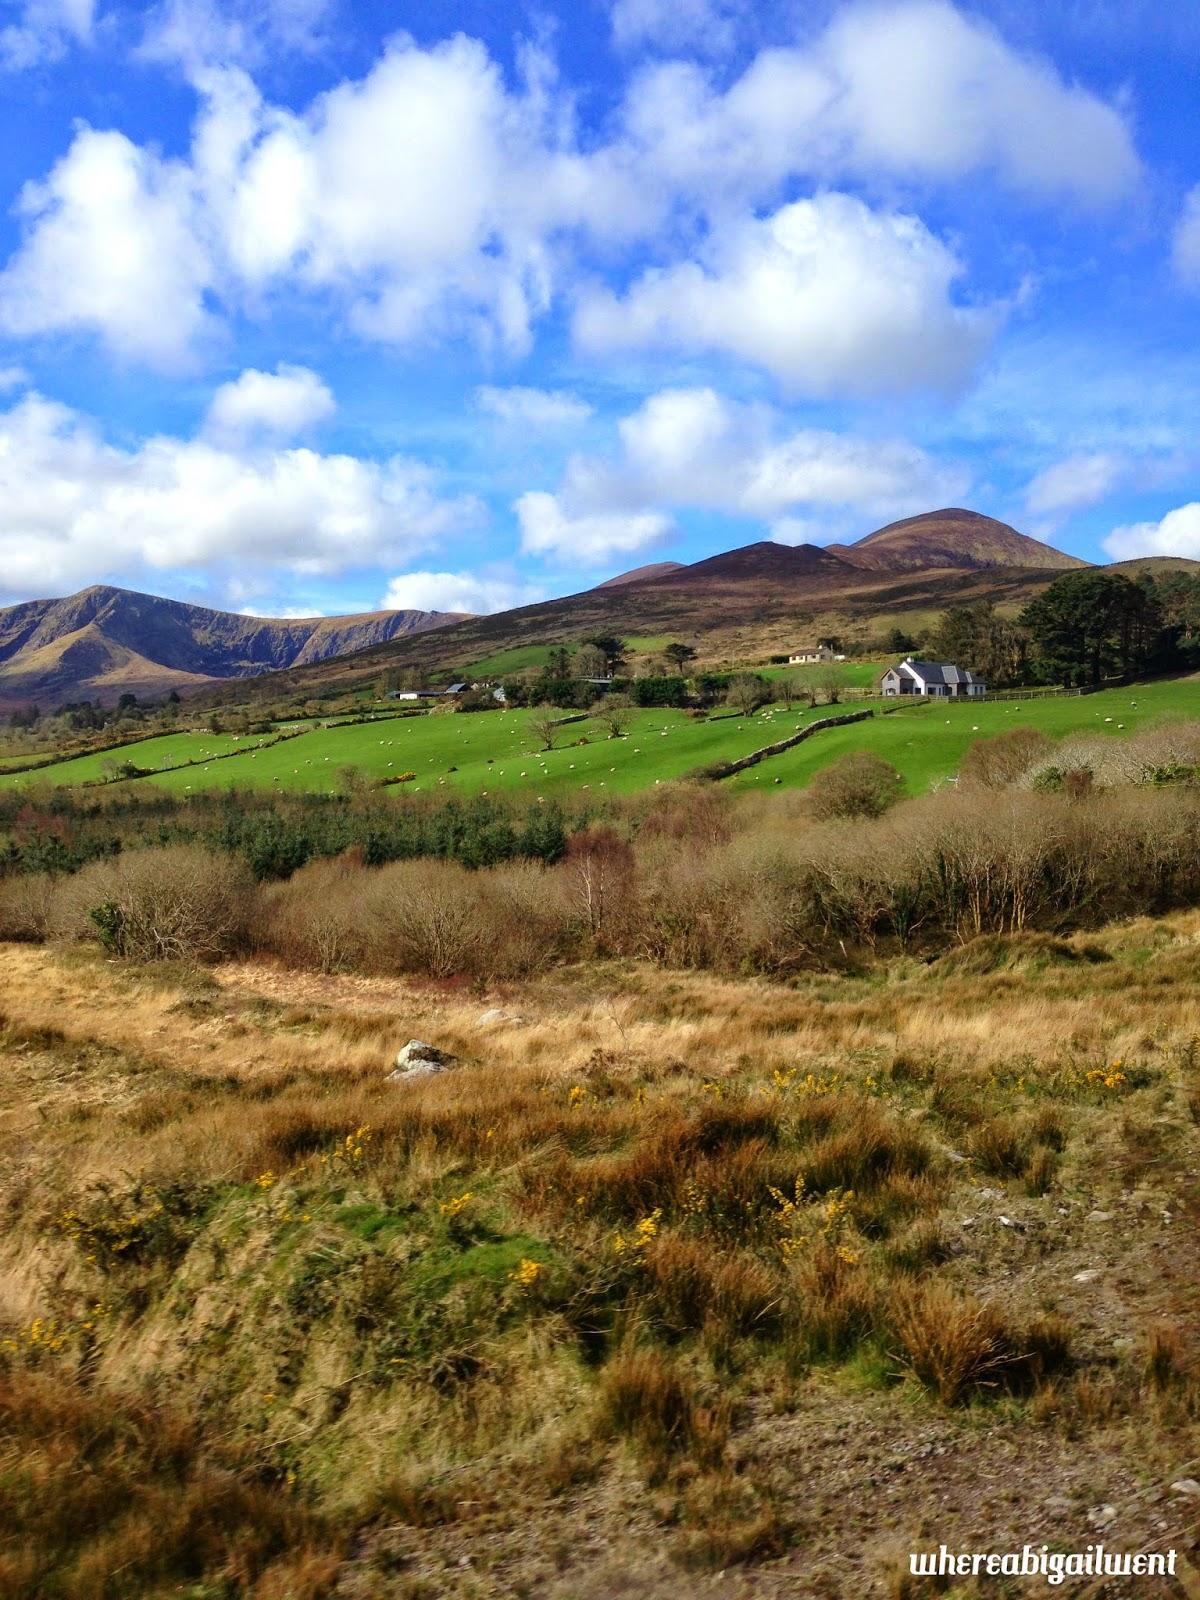 Views of the Irish Countryside